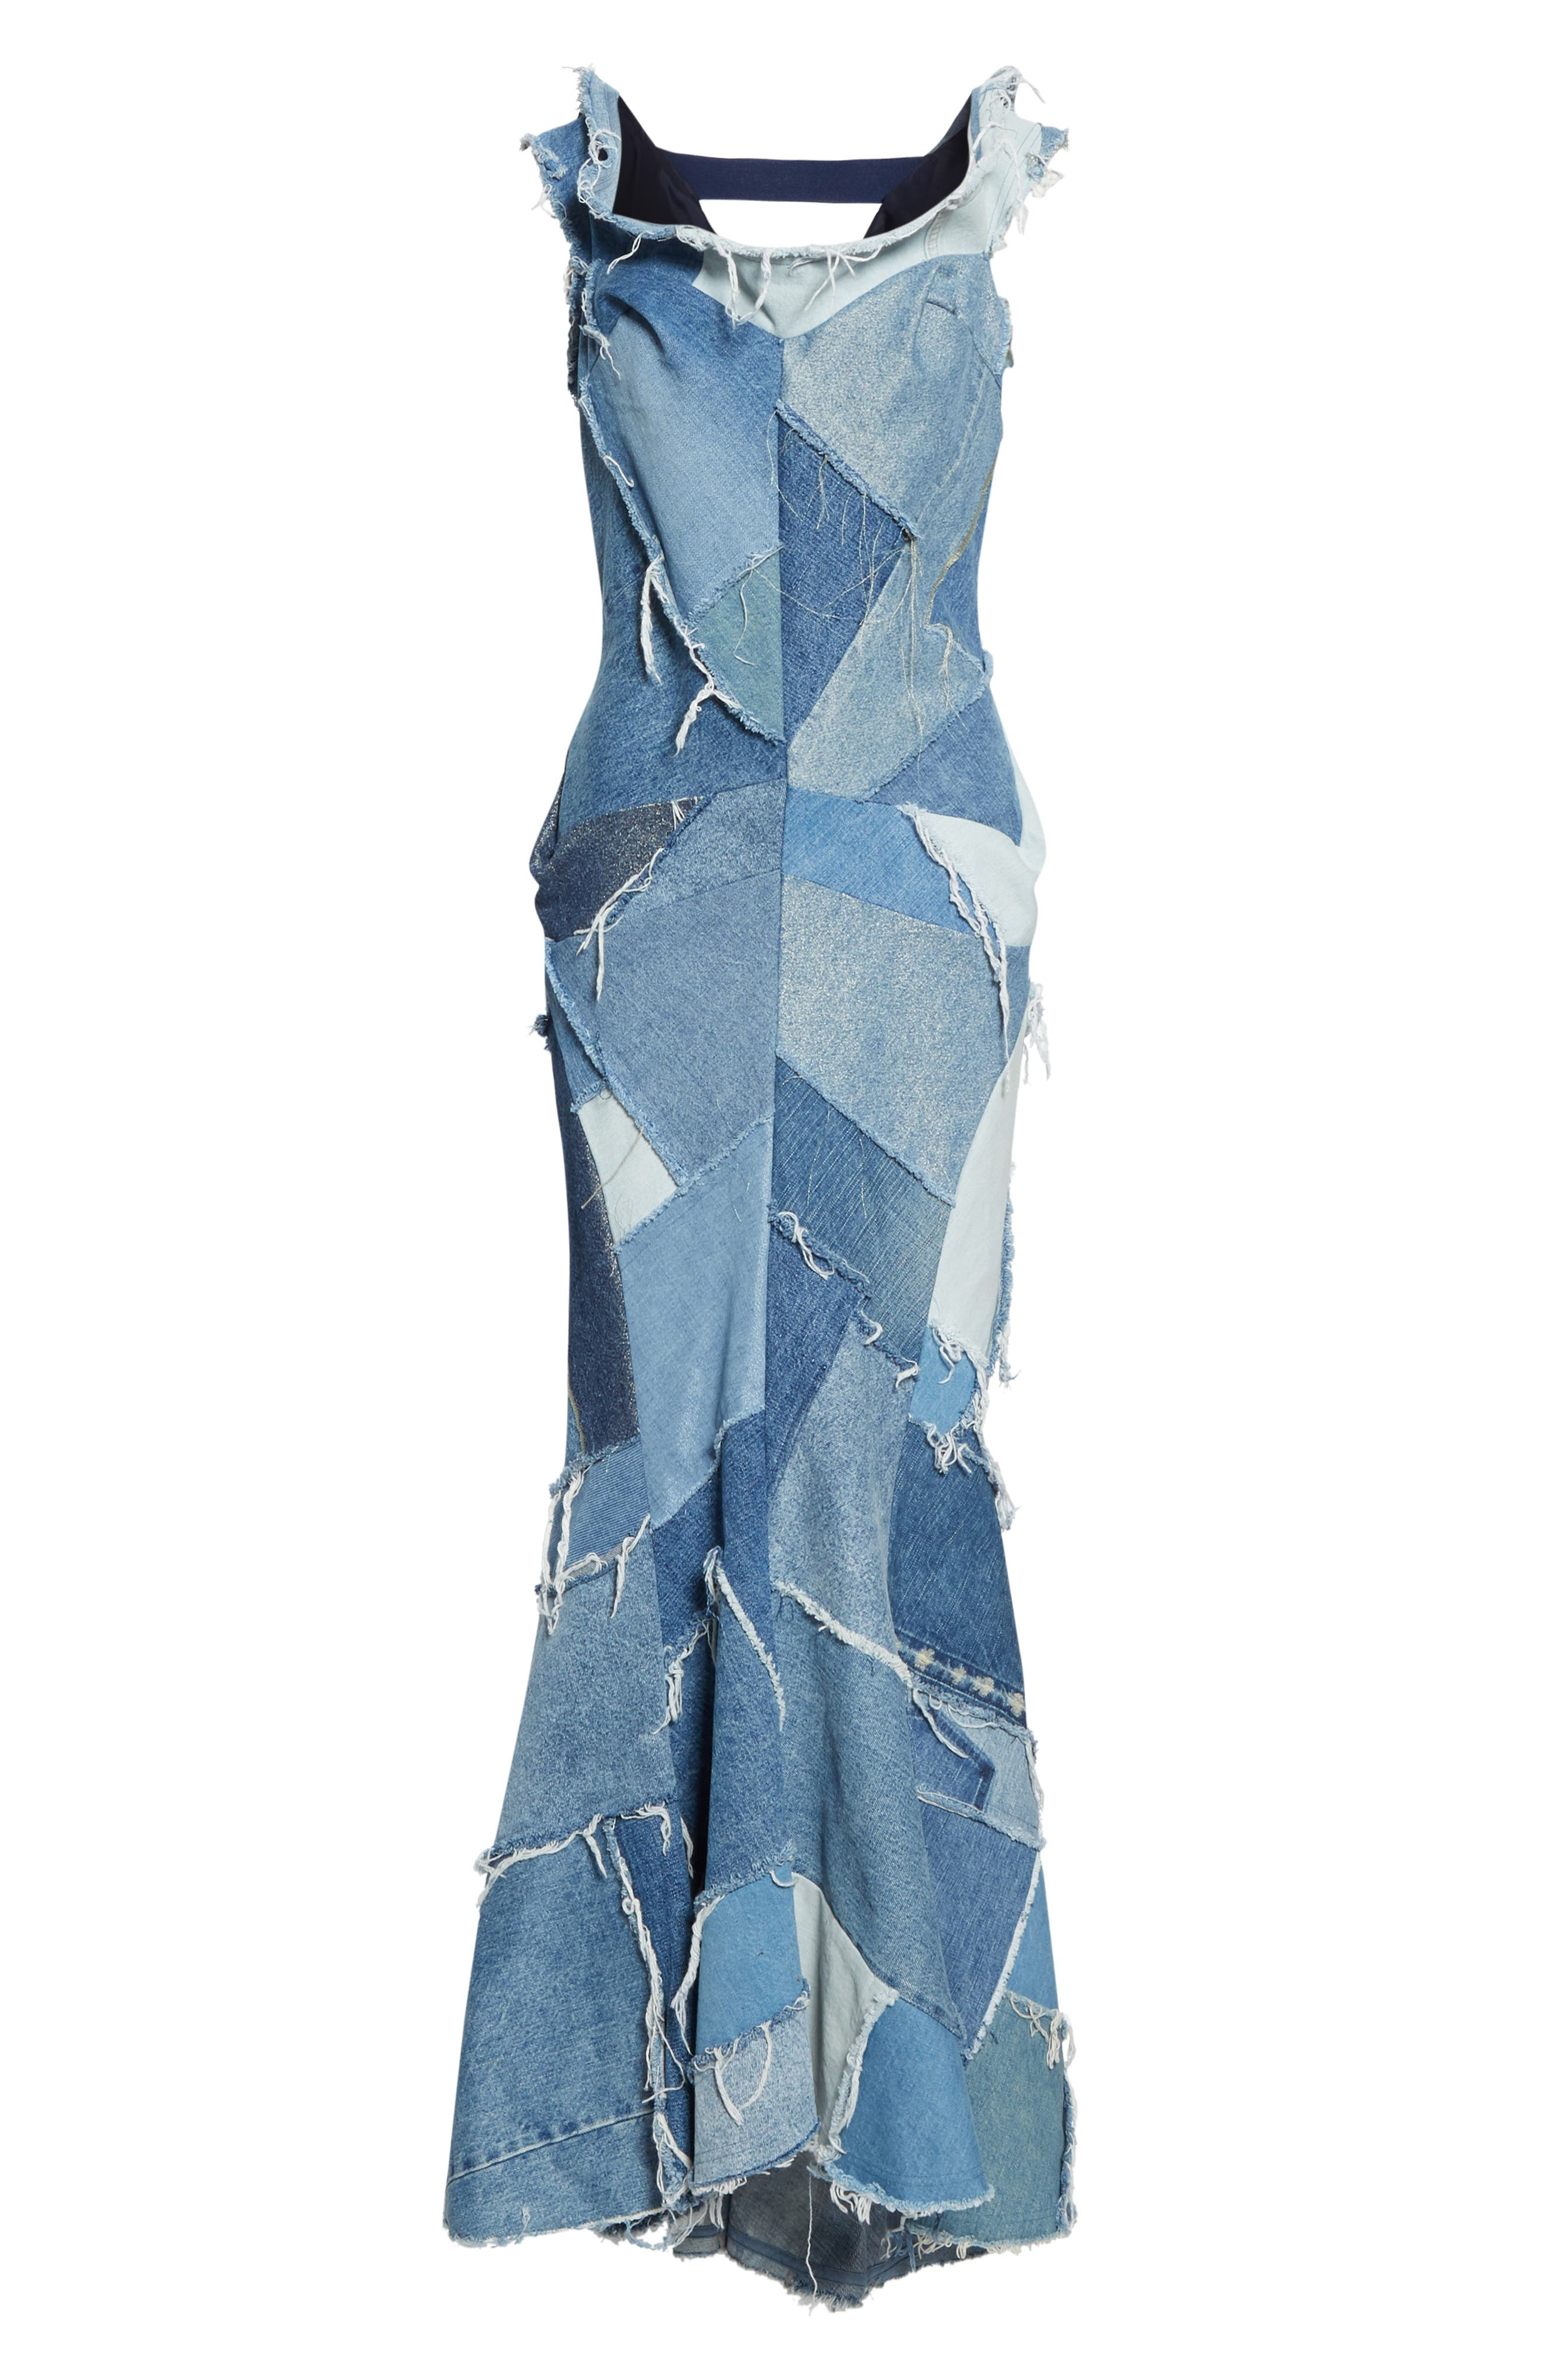 JUNYA WATANABE, Denim Patchwork Off the Shoulder Mermaid Dress, Alternate thumbnail 7, color, INDIGO